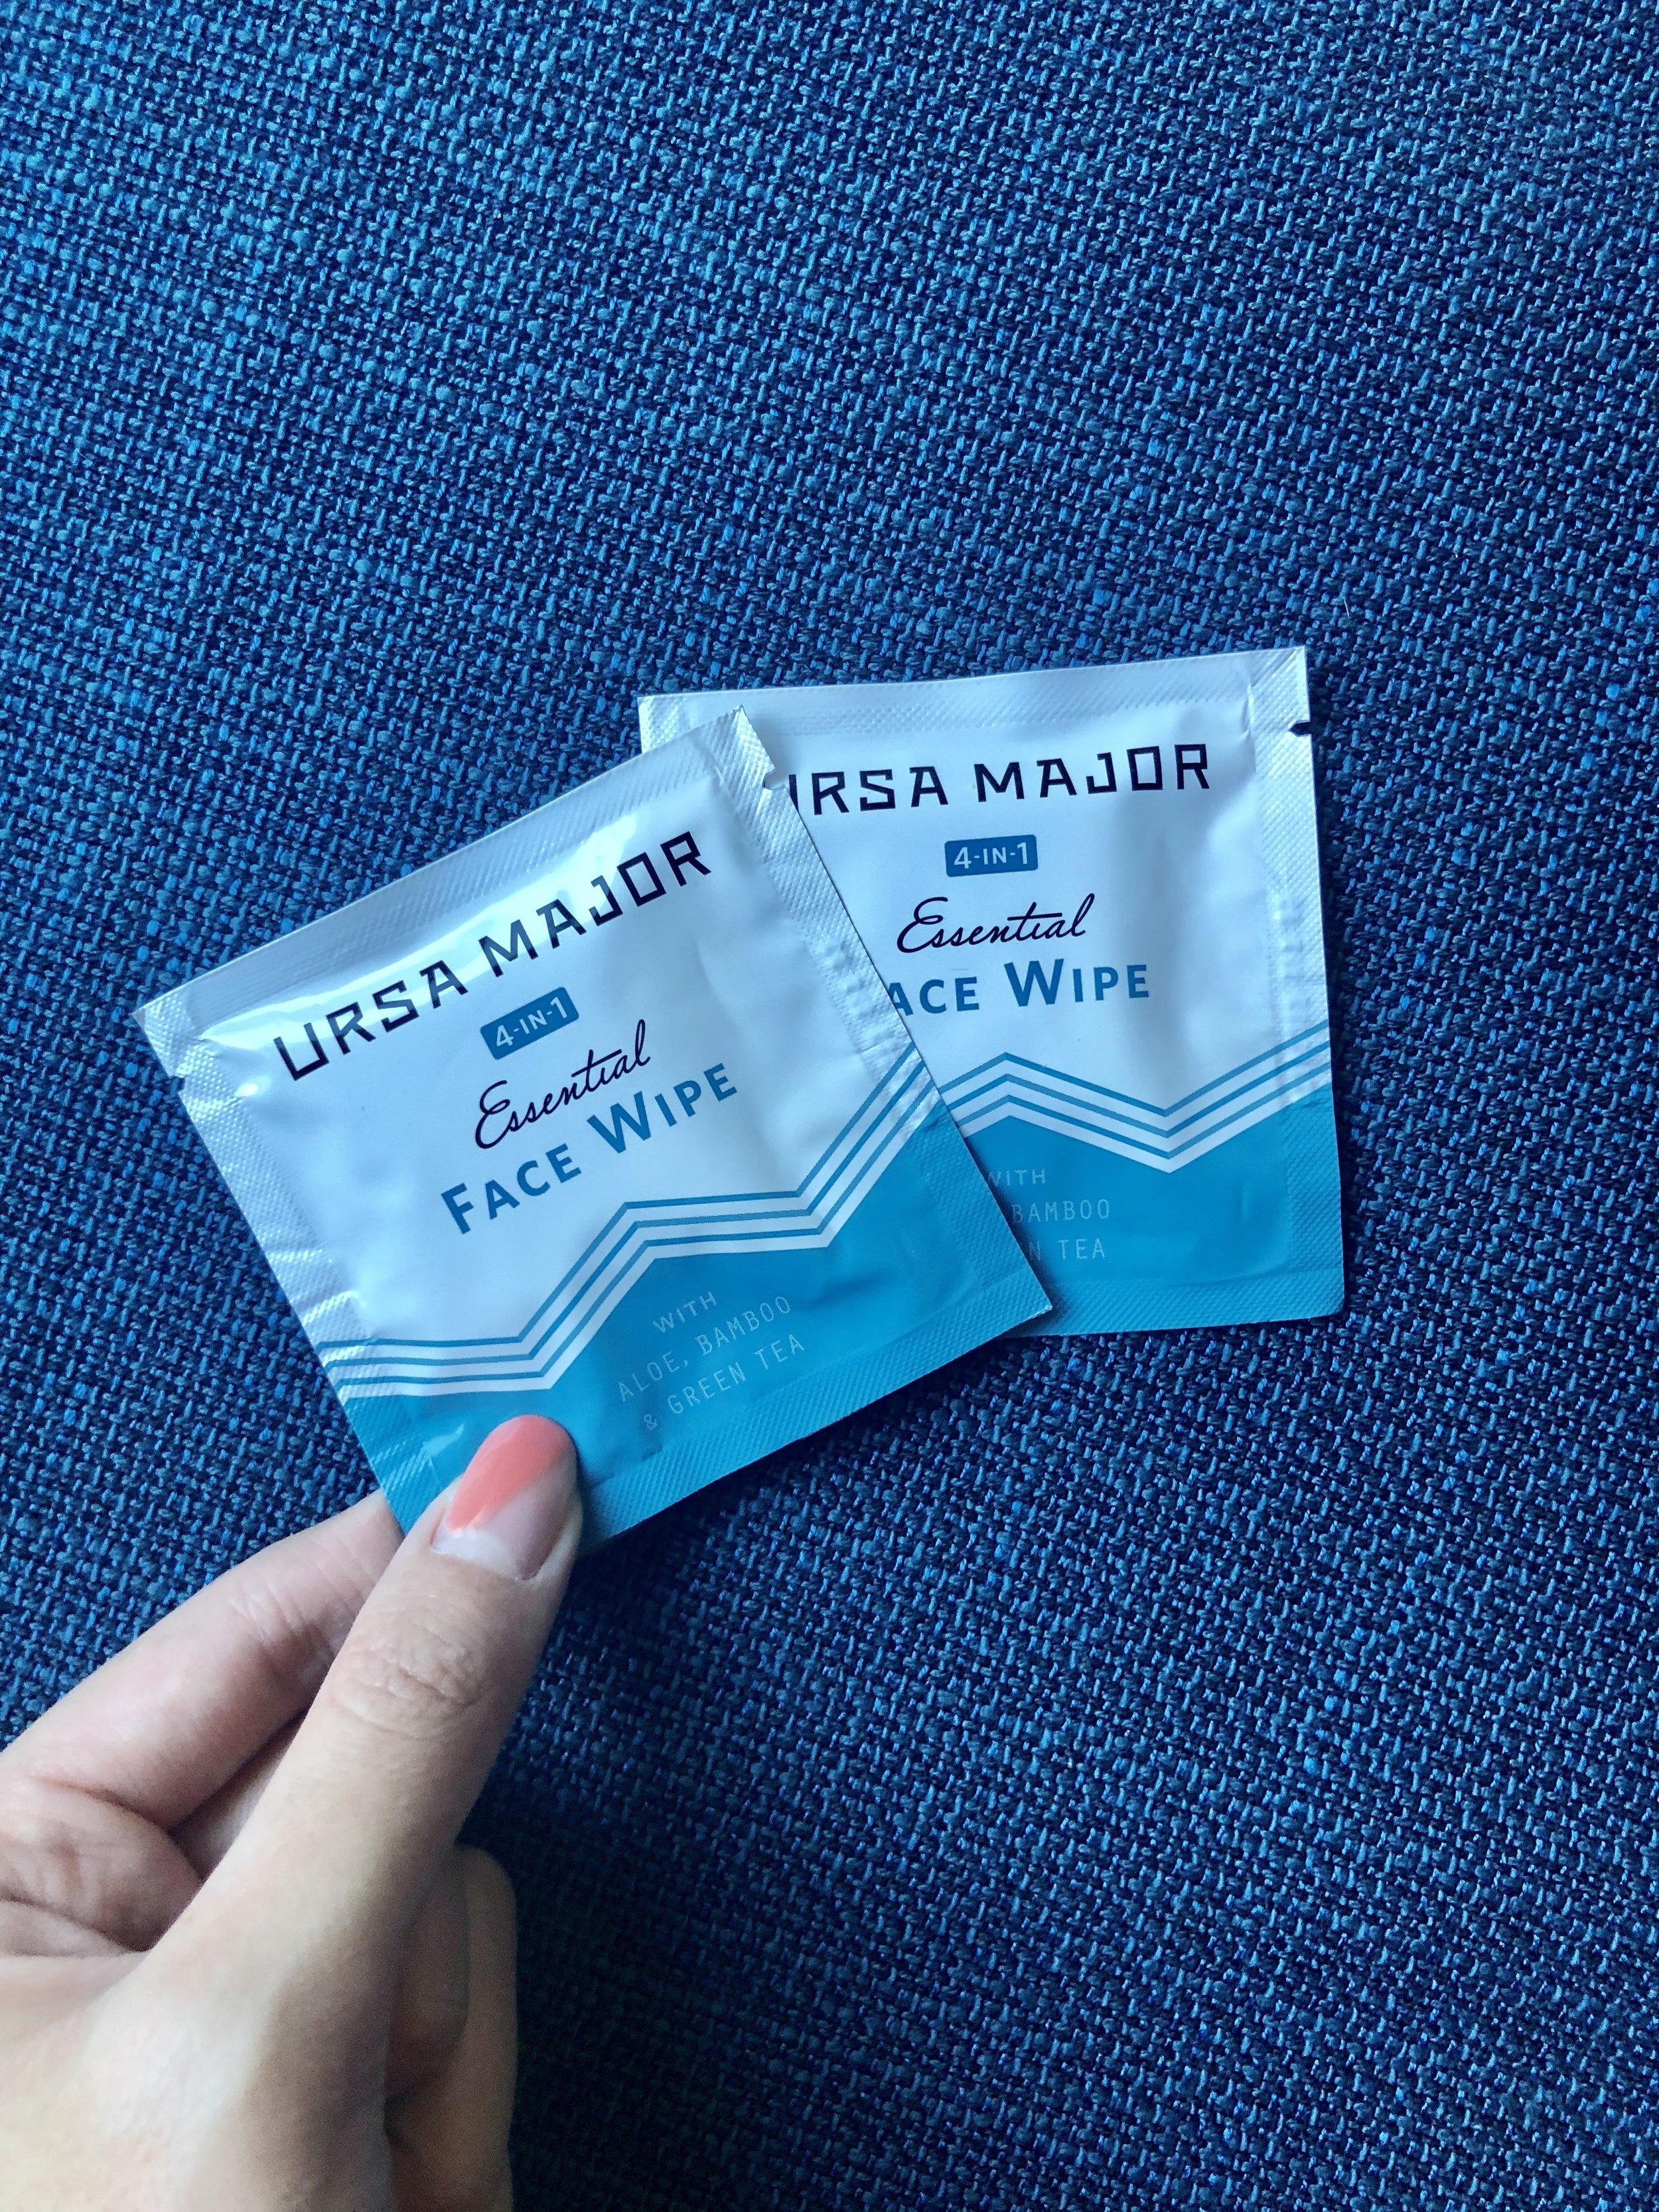 Ursa Major: Essential Face Wipes - Full-Size $24